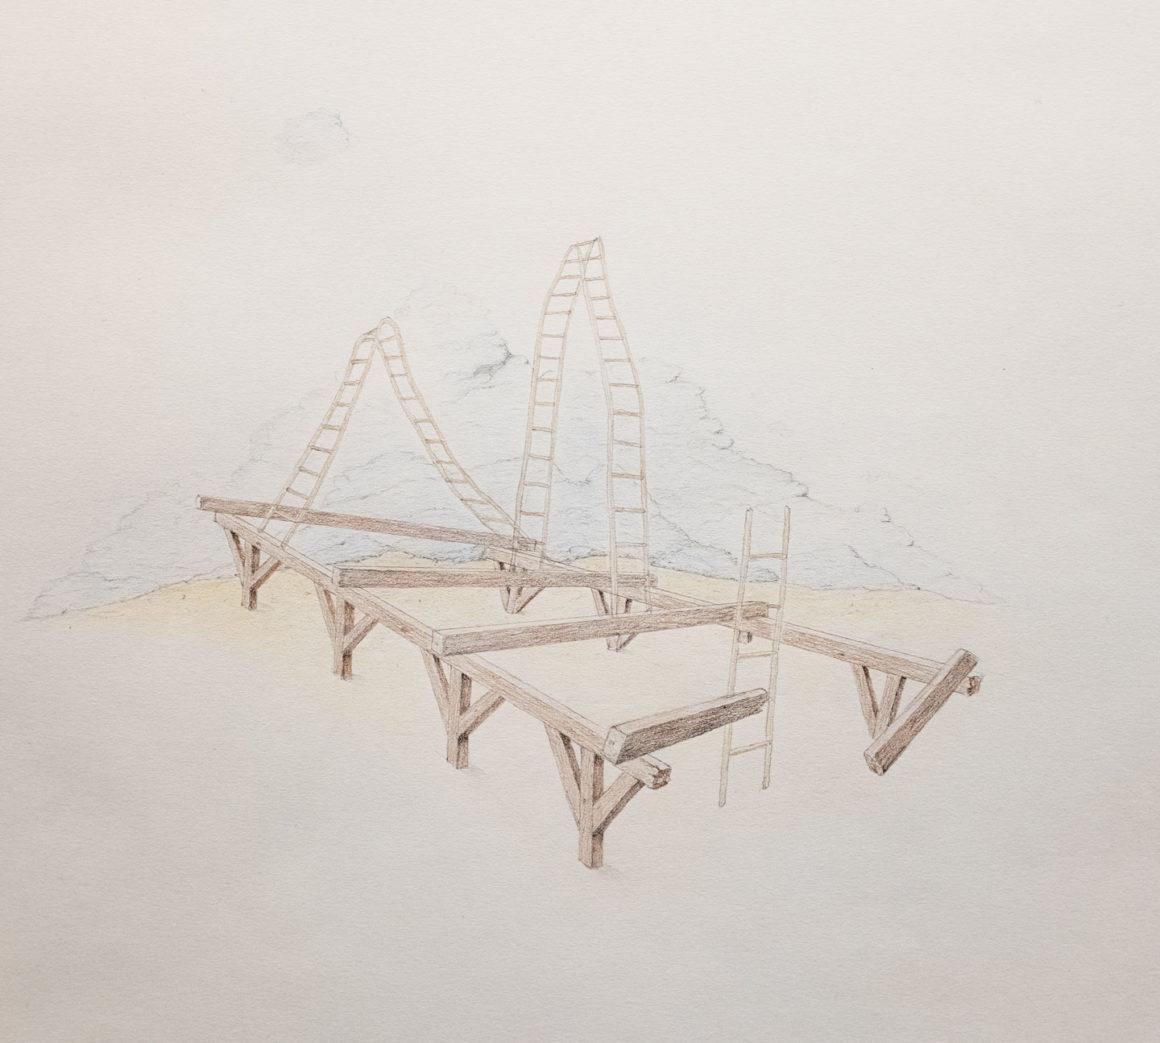 tegning-tegnerforbundet_tore_reisch_16